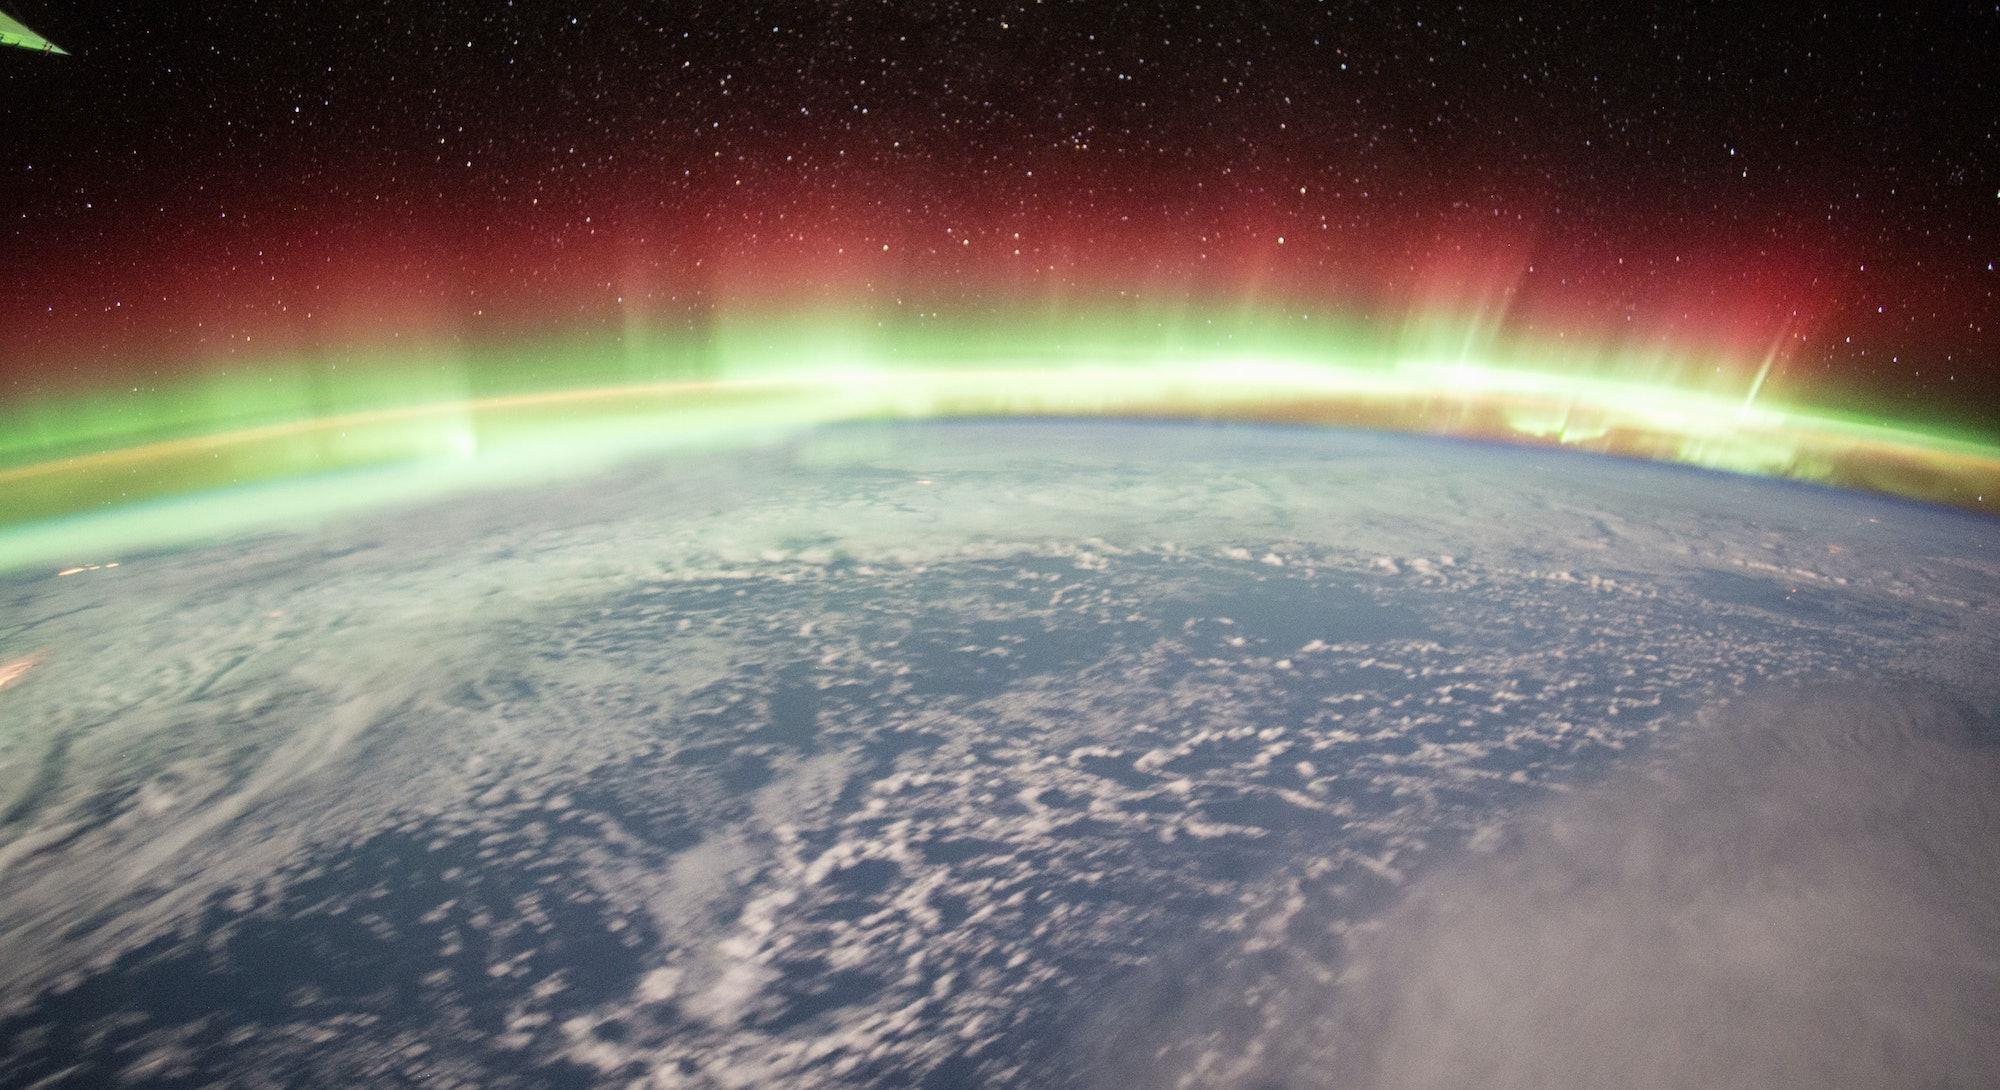 A brilliant and vivid Aurora Borealis illuminates the Earth's northern hemisphere on Jan 20, 2016, p...